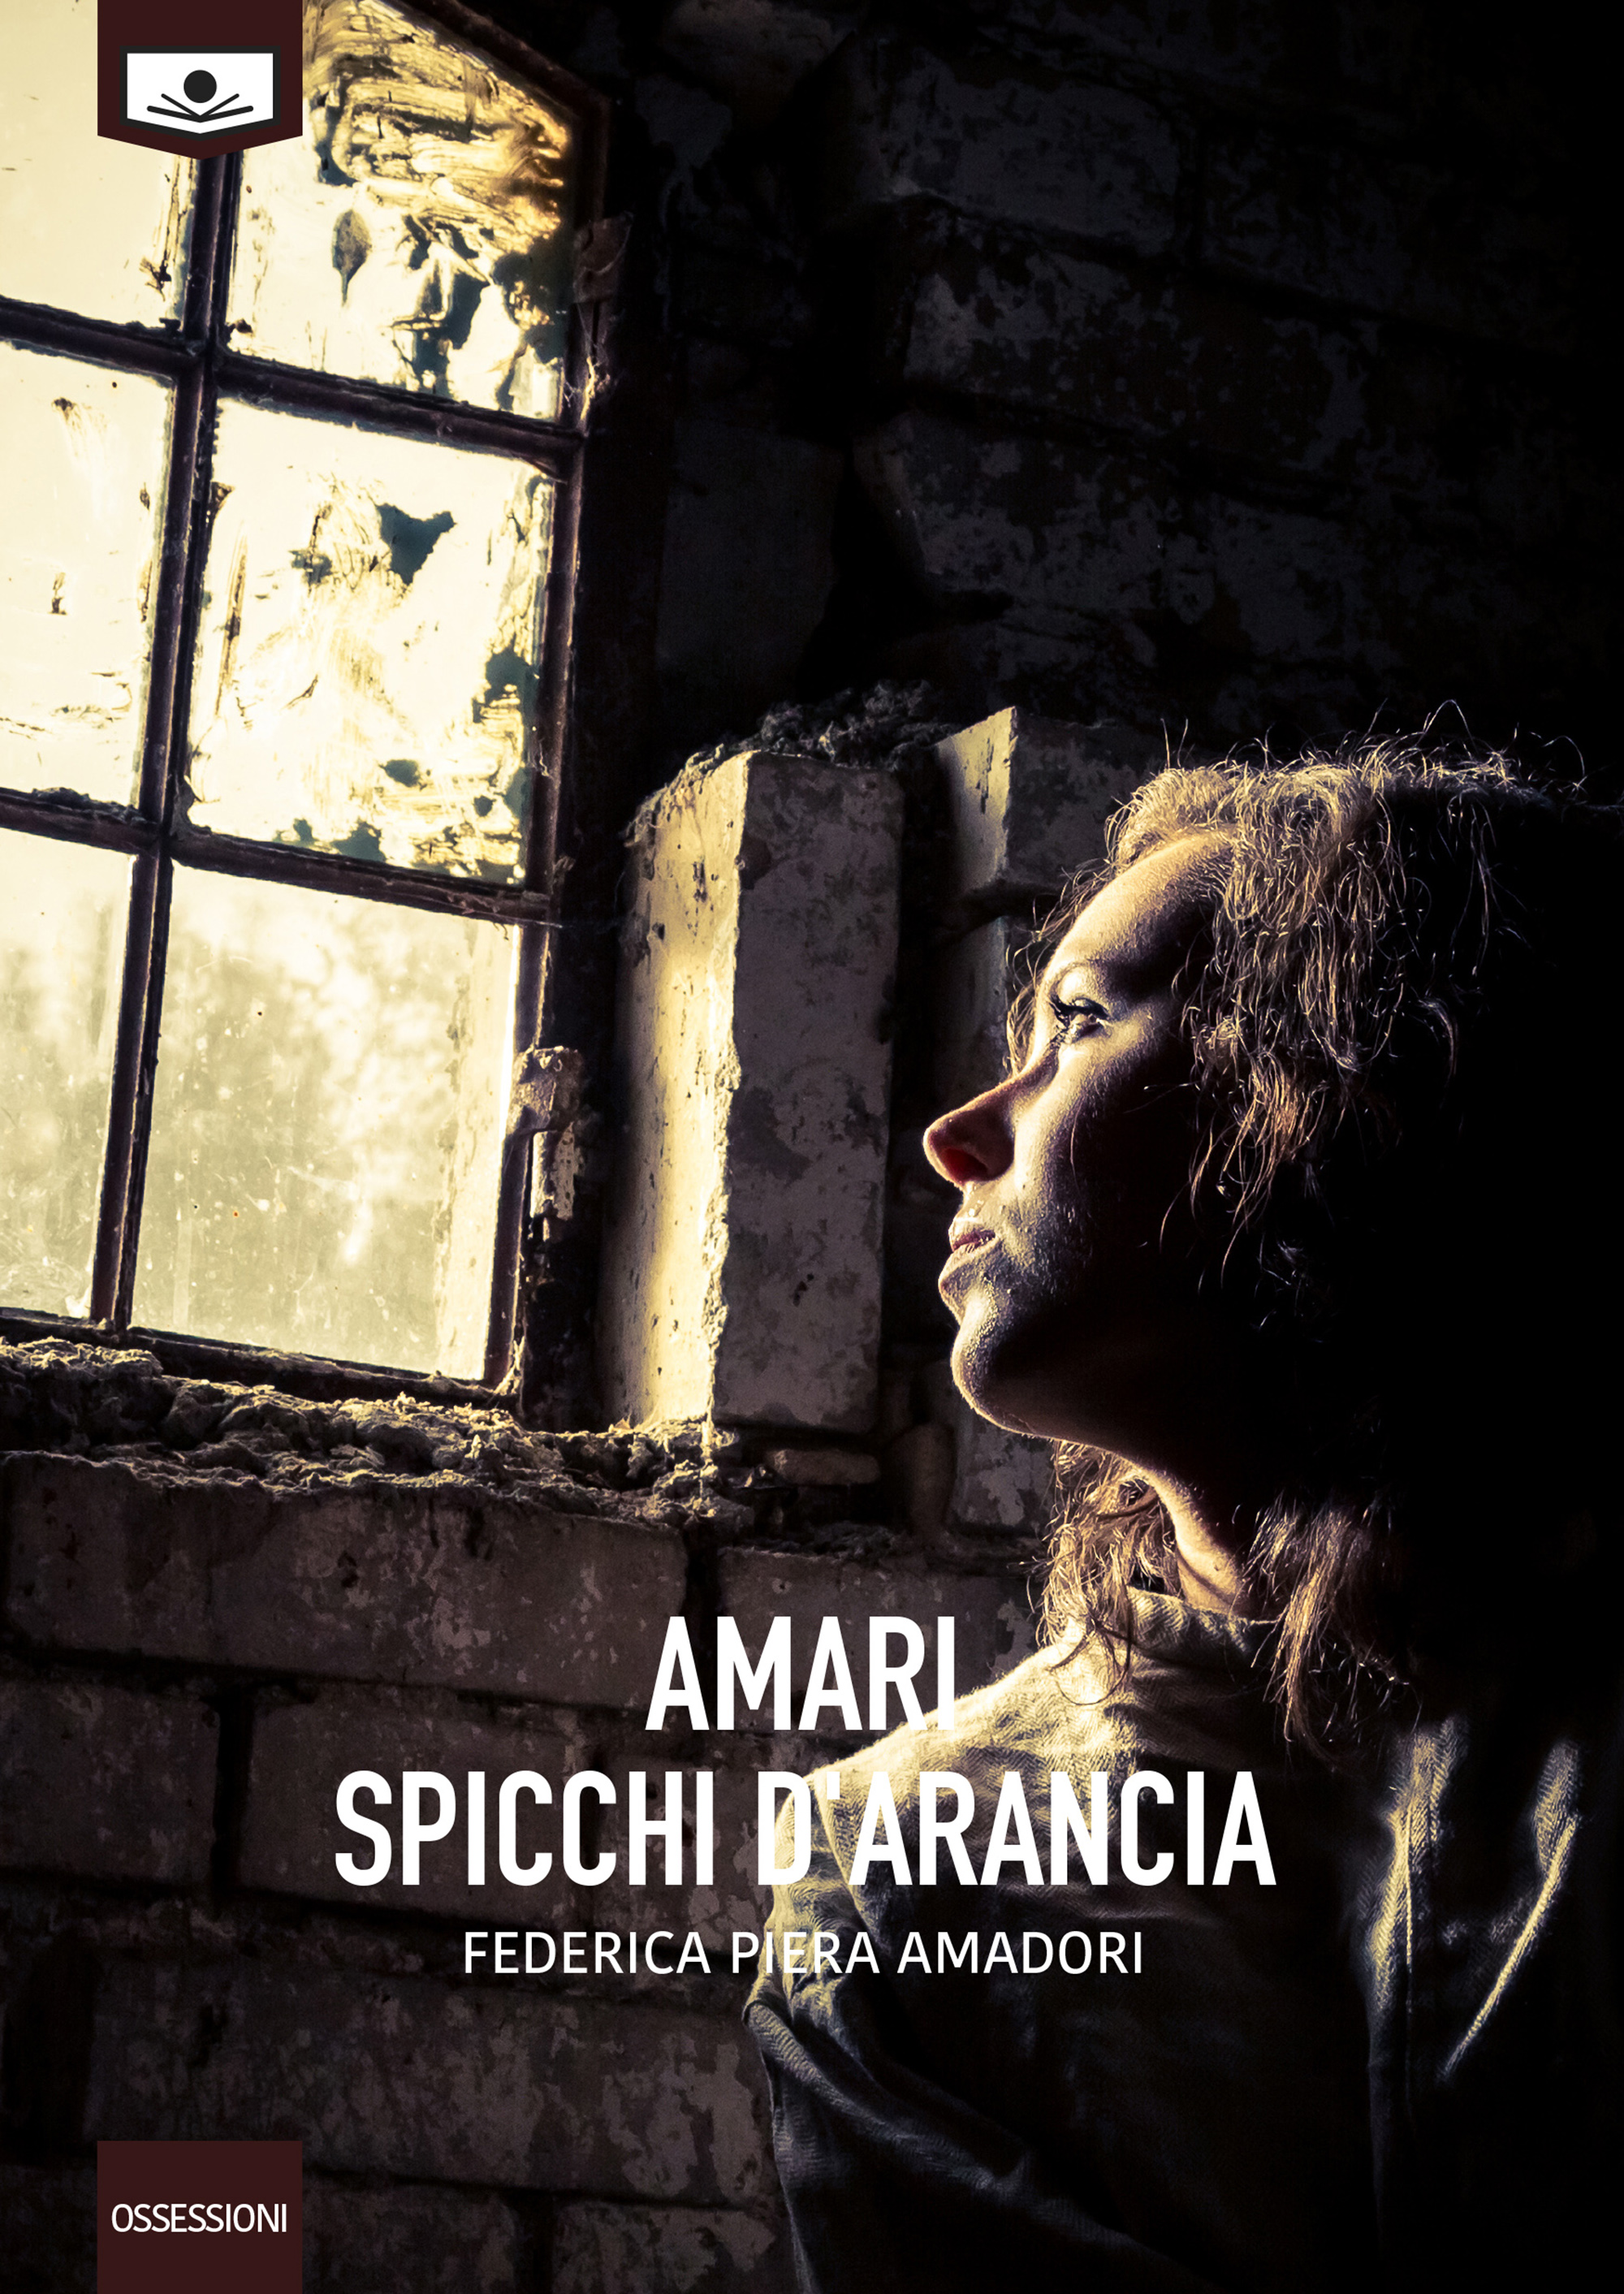 Amari spicchi d'arancia – Federica Amadori